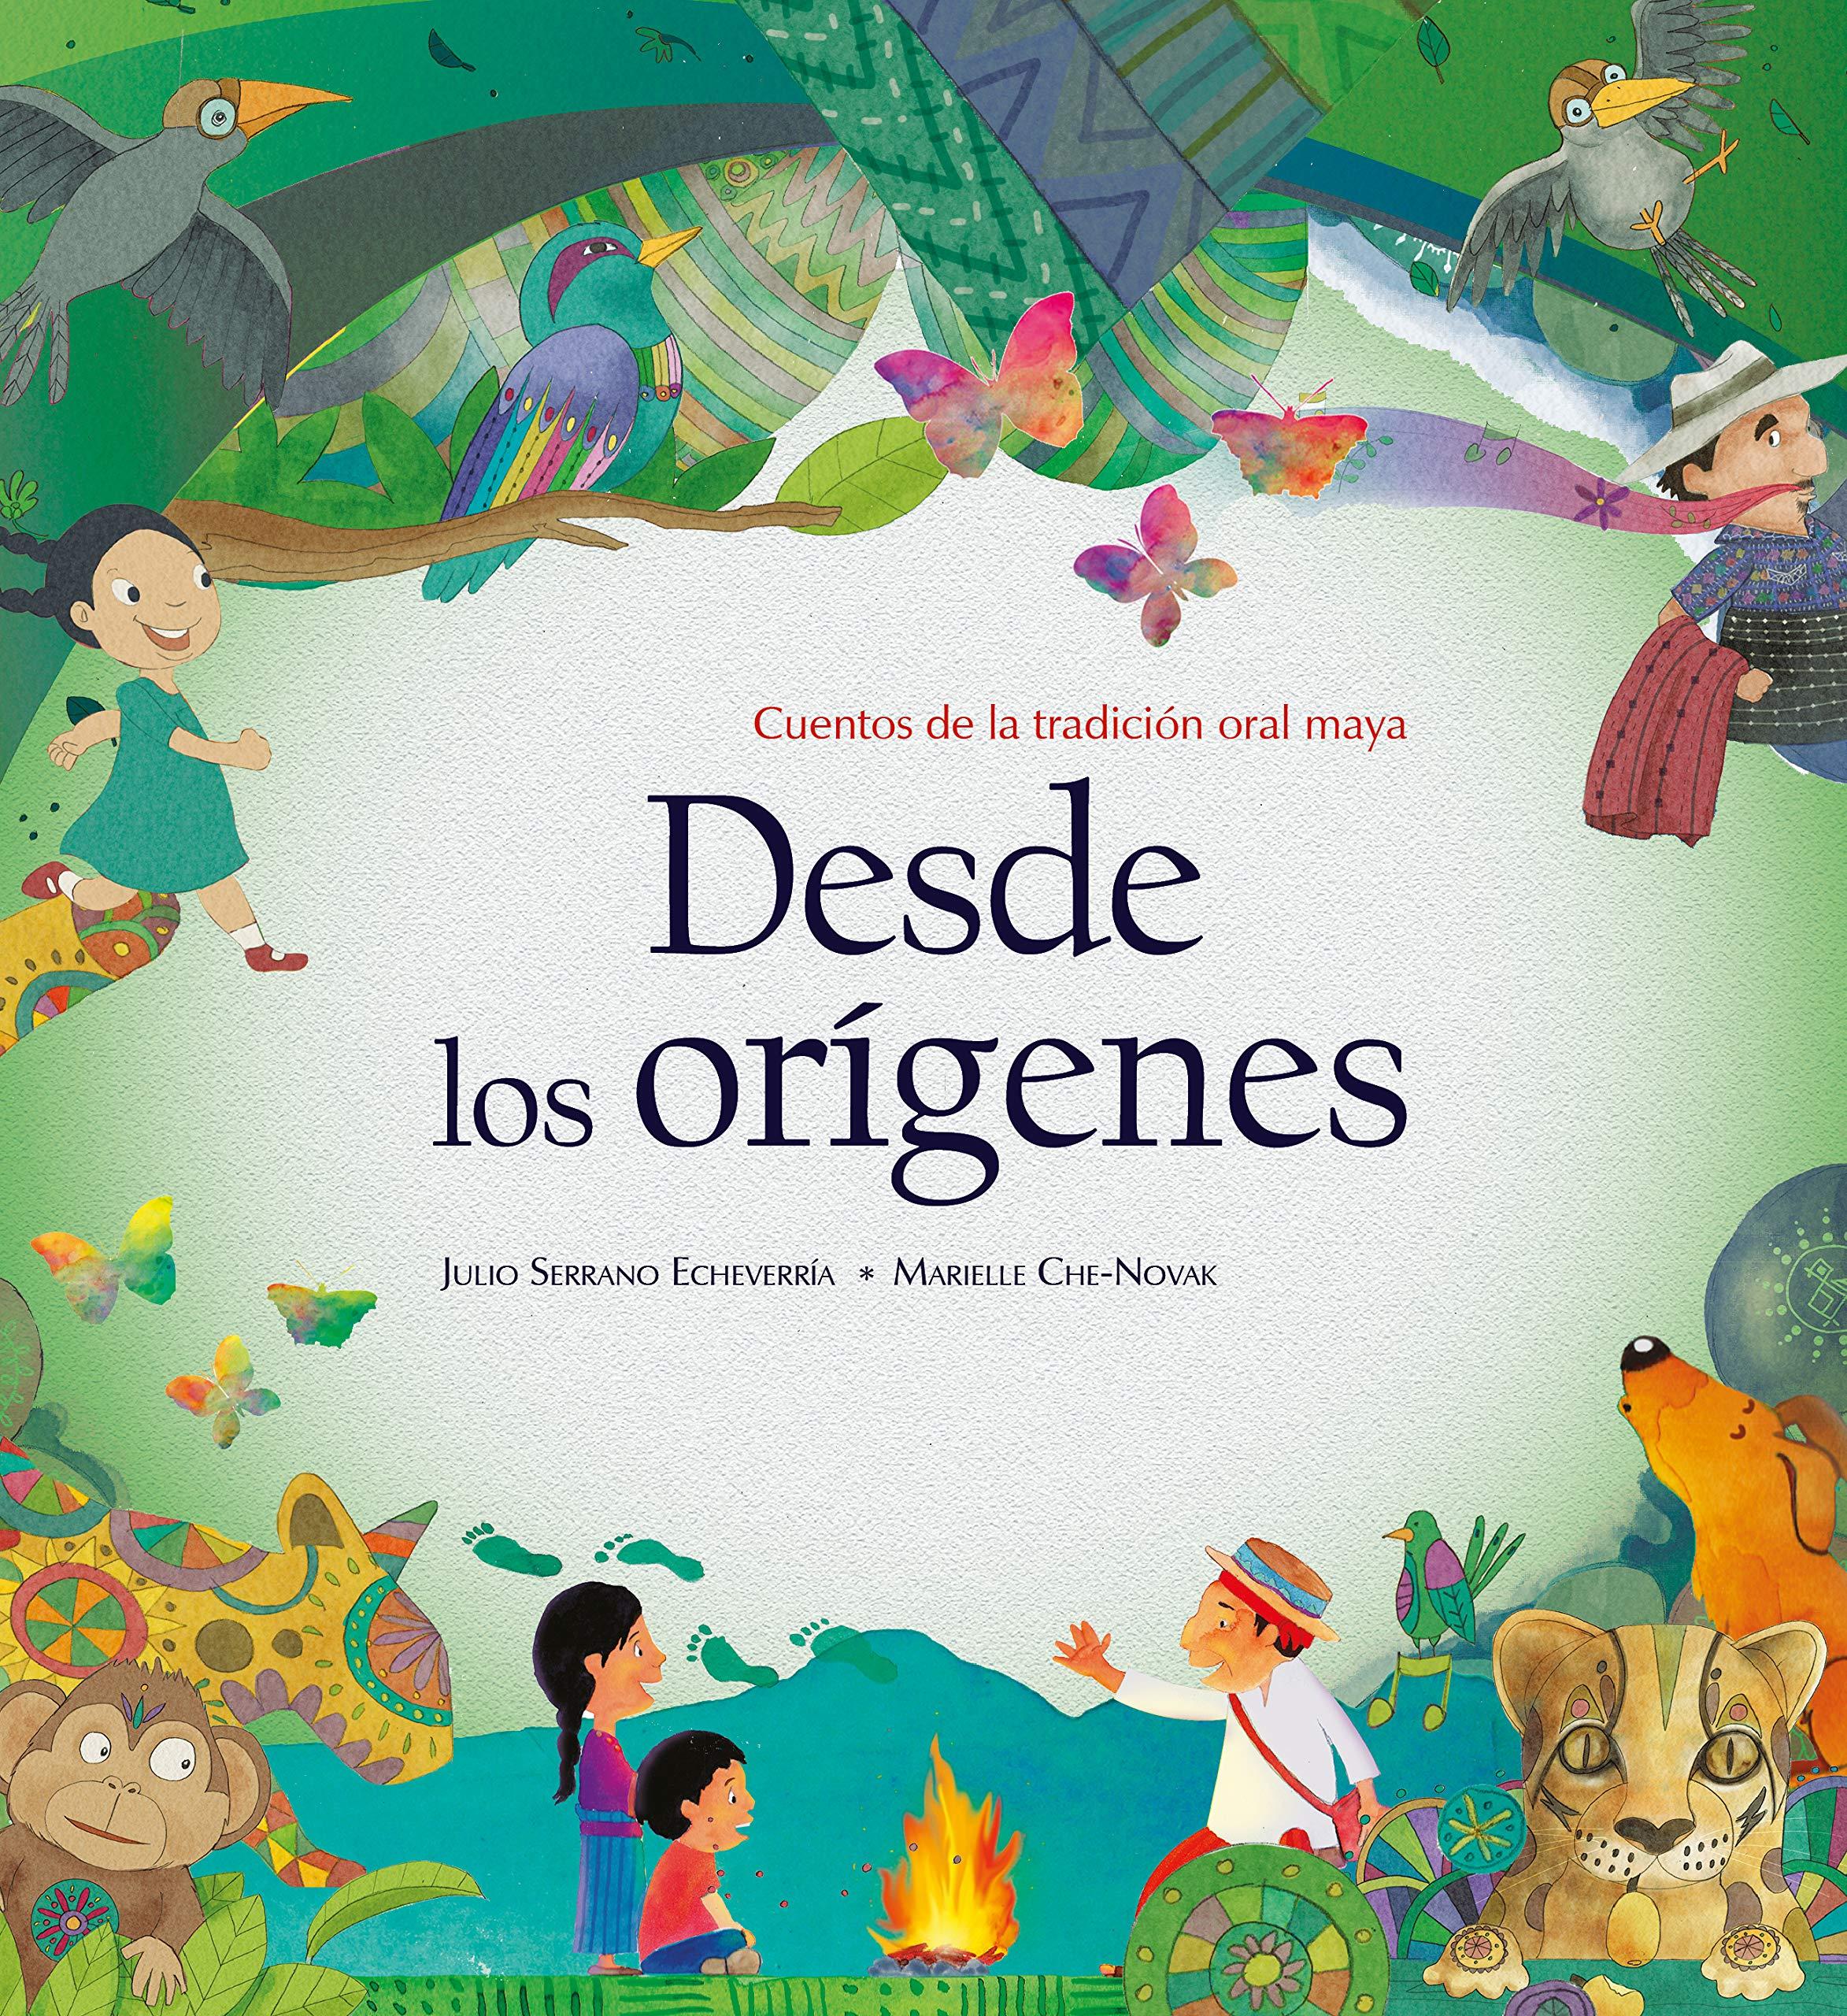 Desde los origenes: Julio Serrano Echeveverría: 9789974863293: Amazon.com: Books